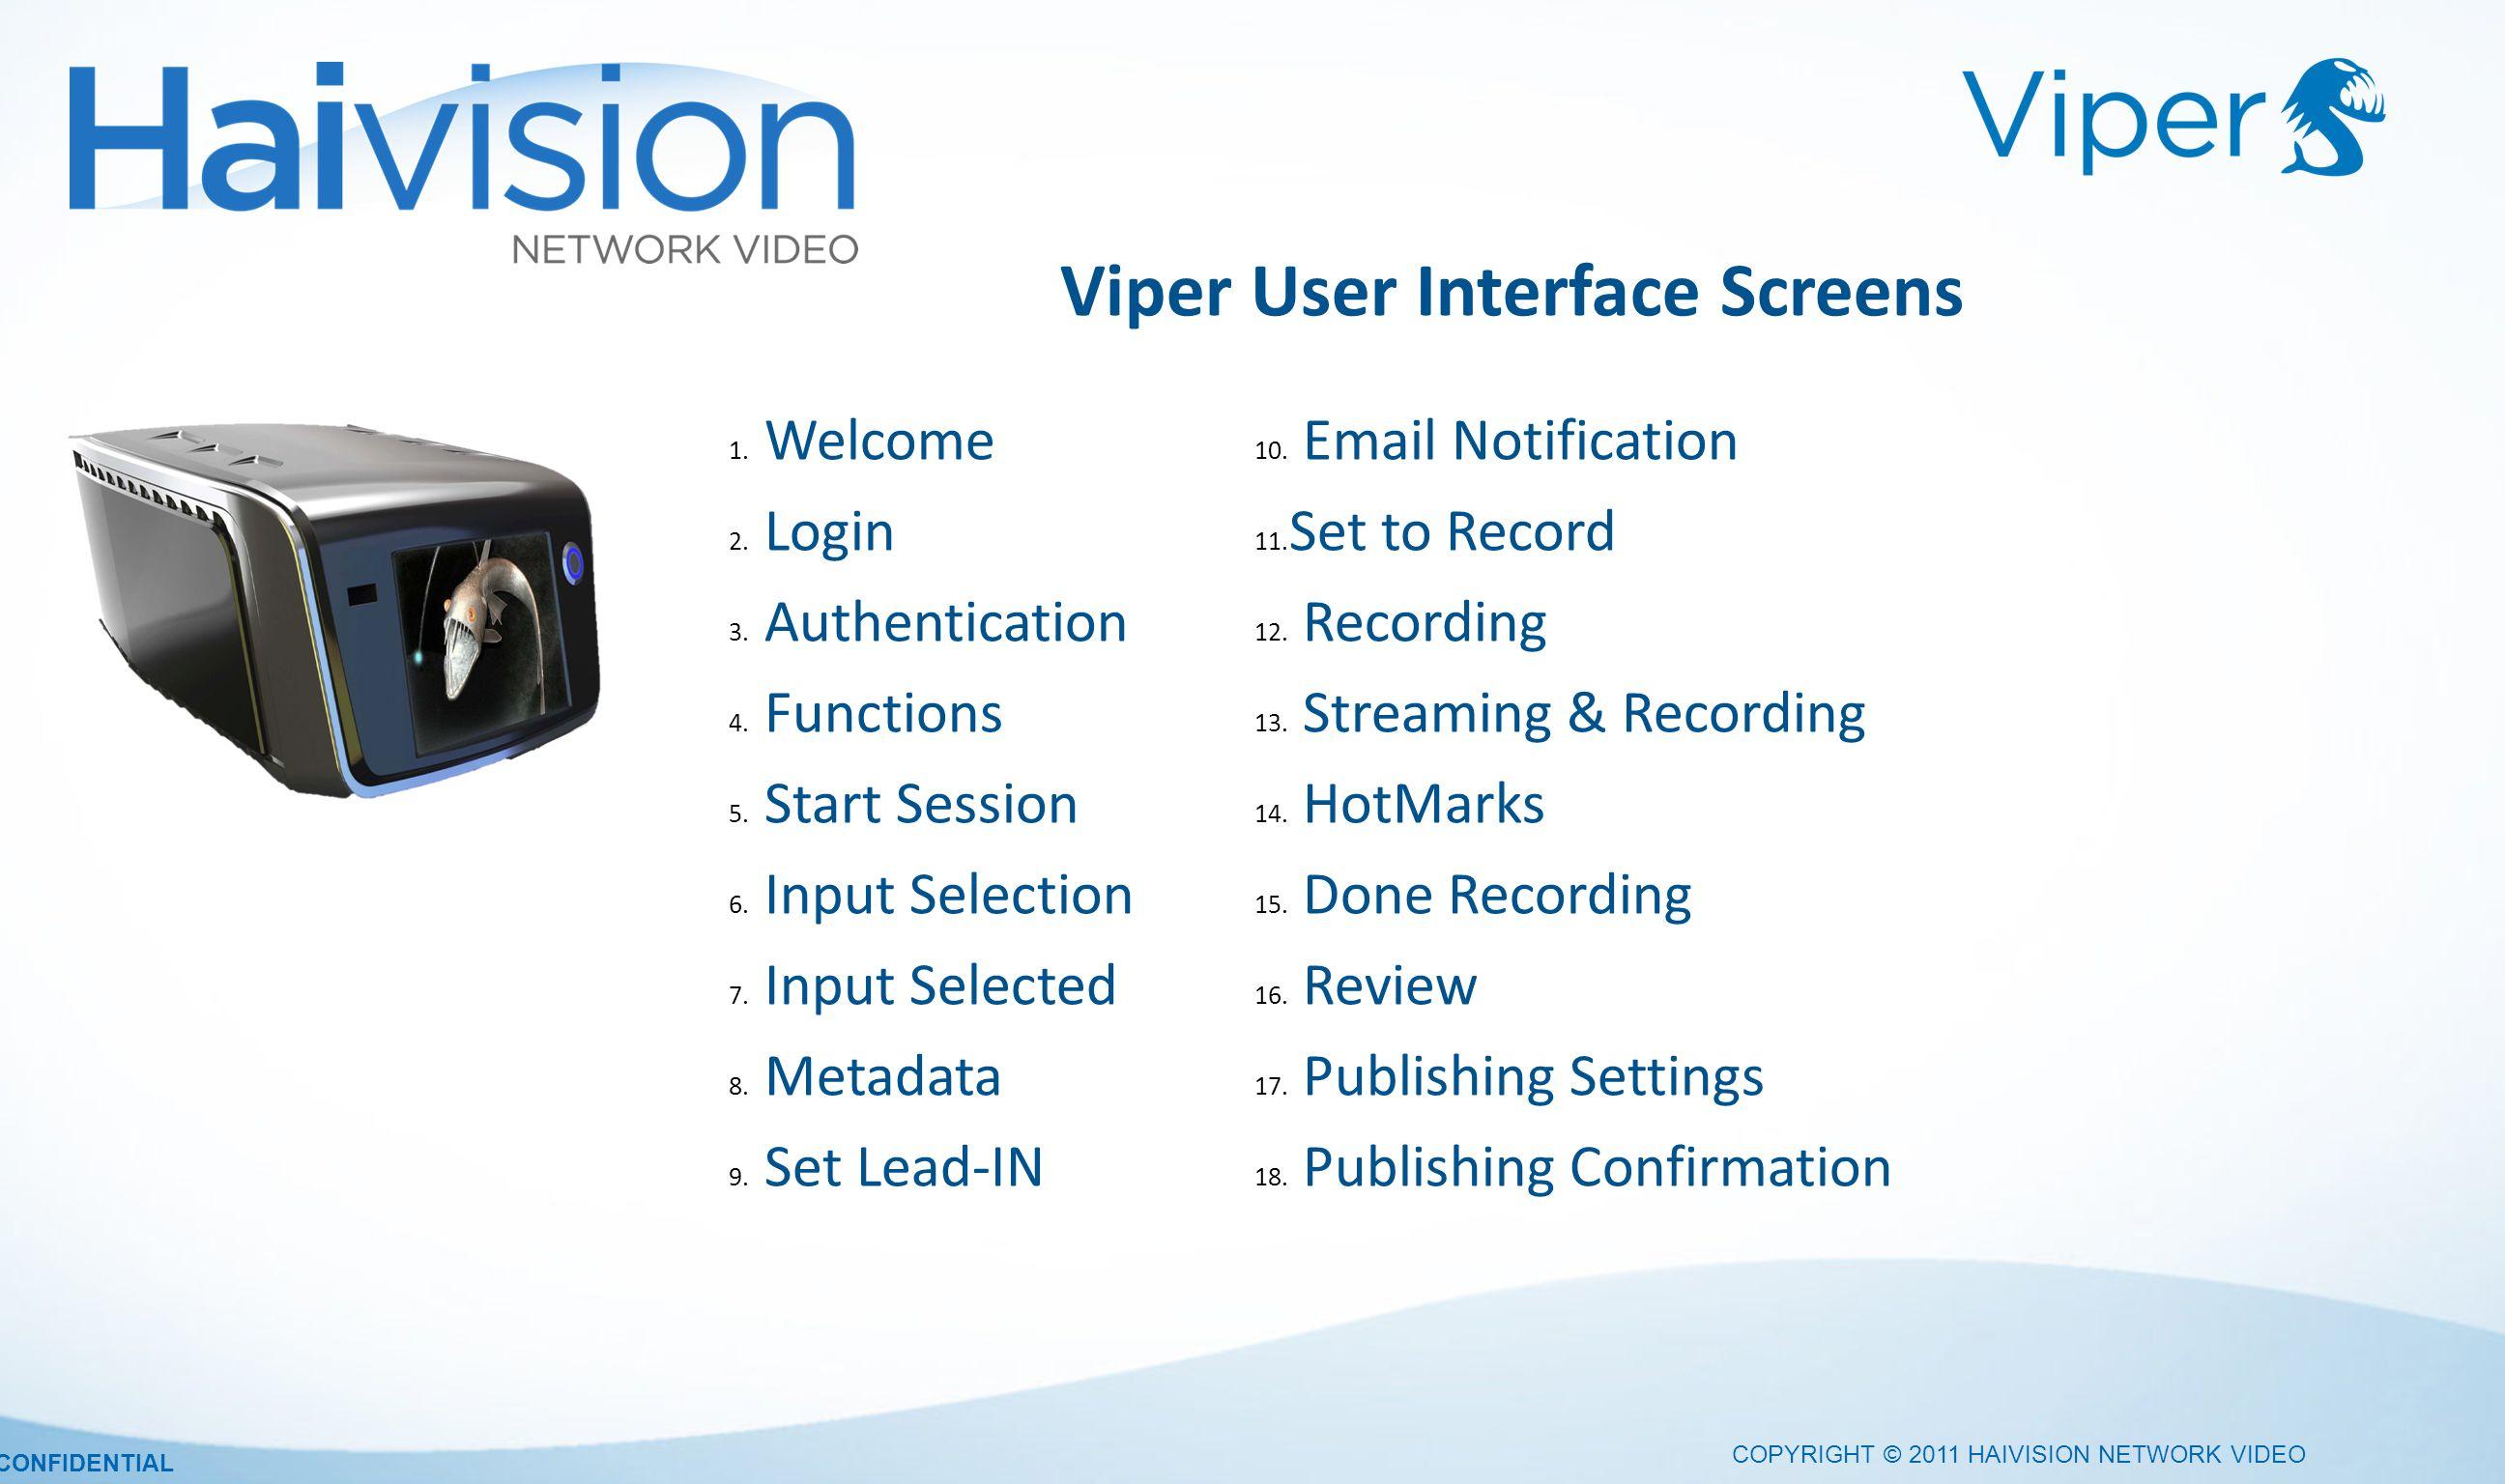 Viper User Interface Screens